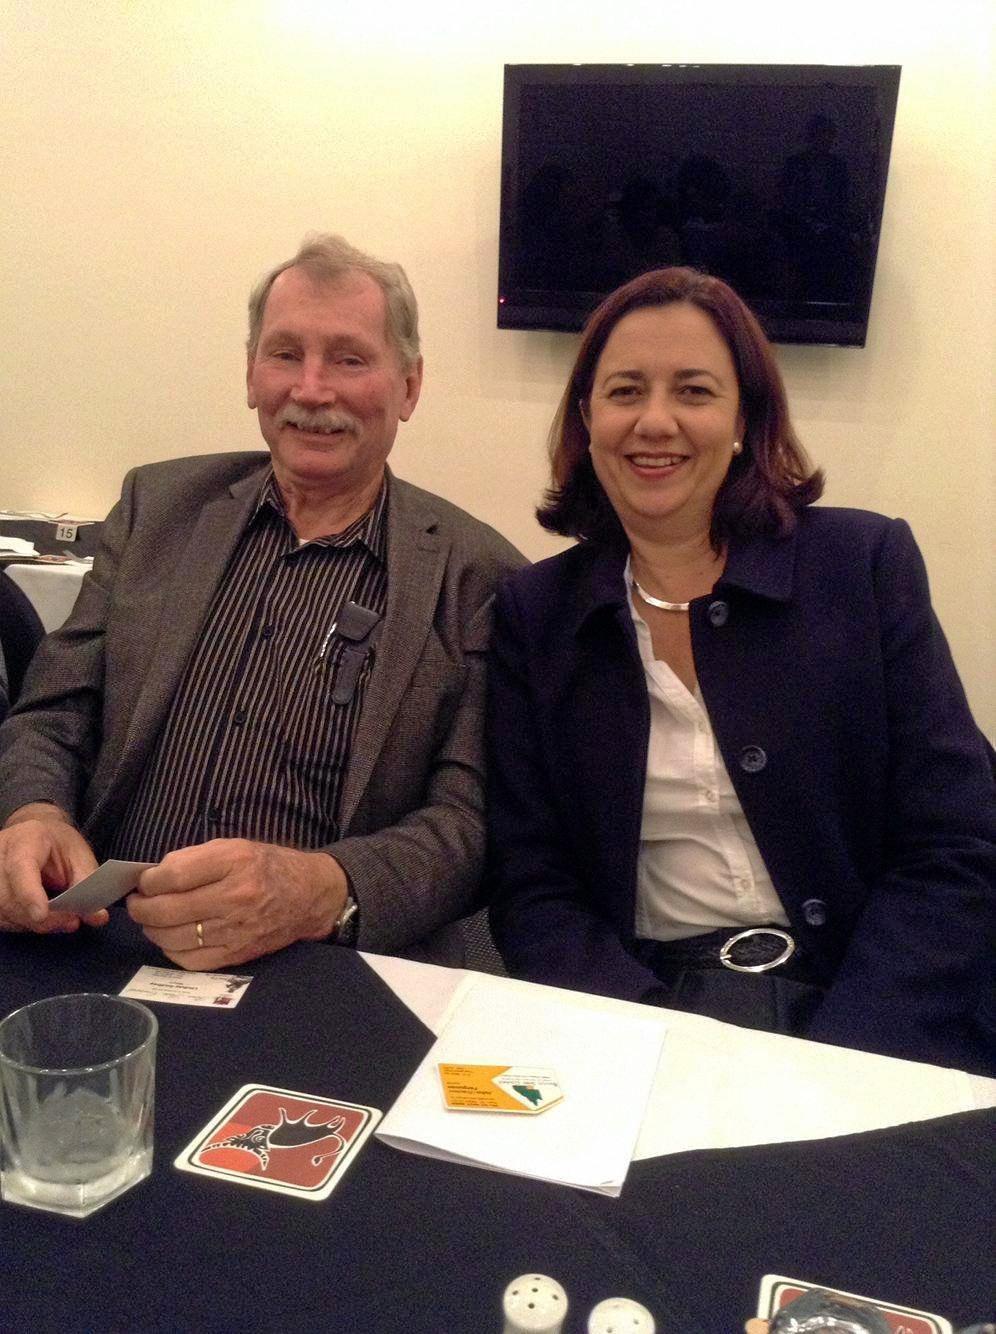 Denis Cook with Queensland Labor premier Annastacia Palaszczuk.